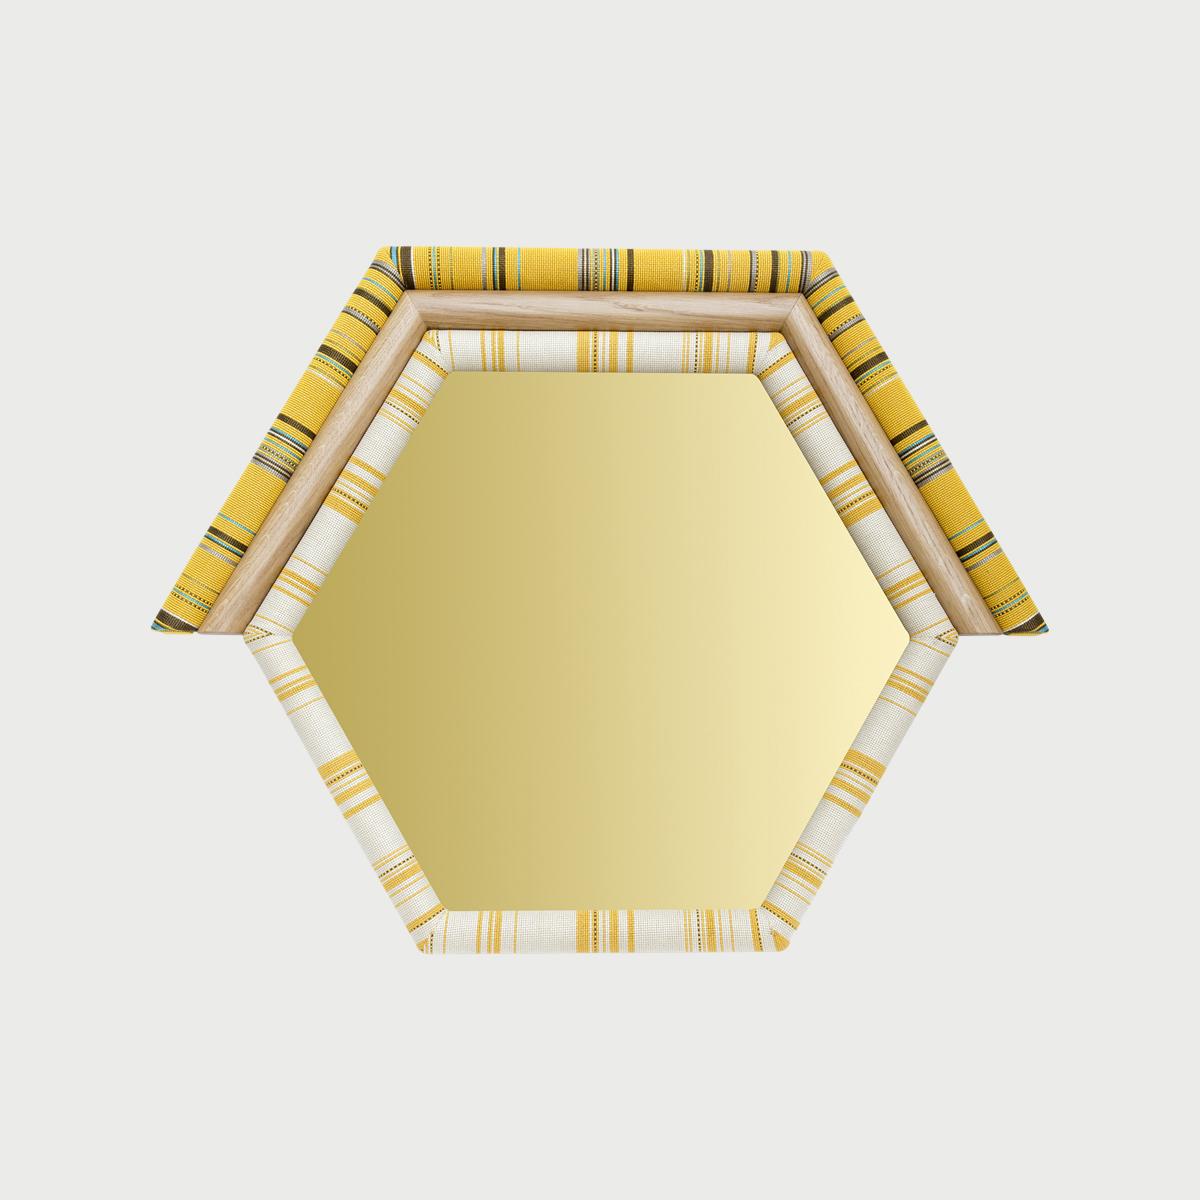 Merve yellow mirror final small v2  281 29